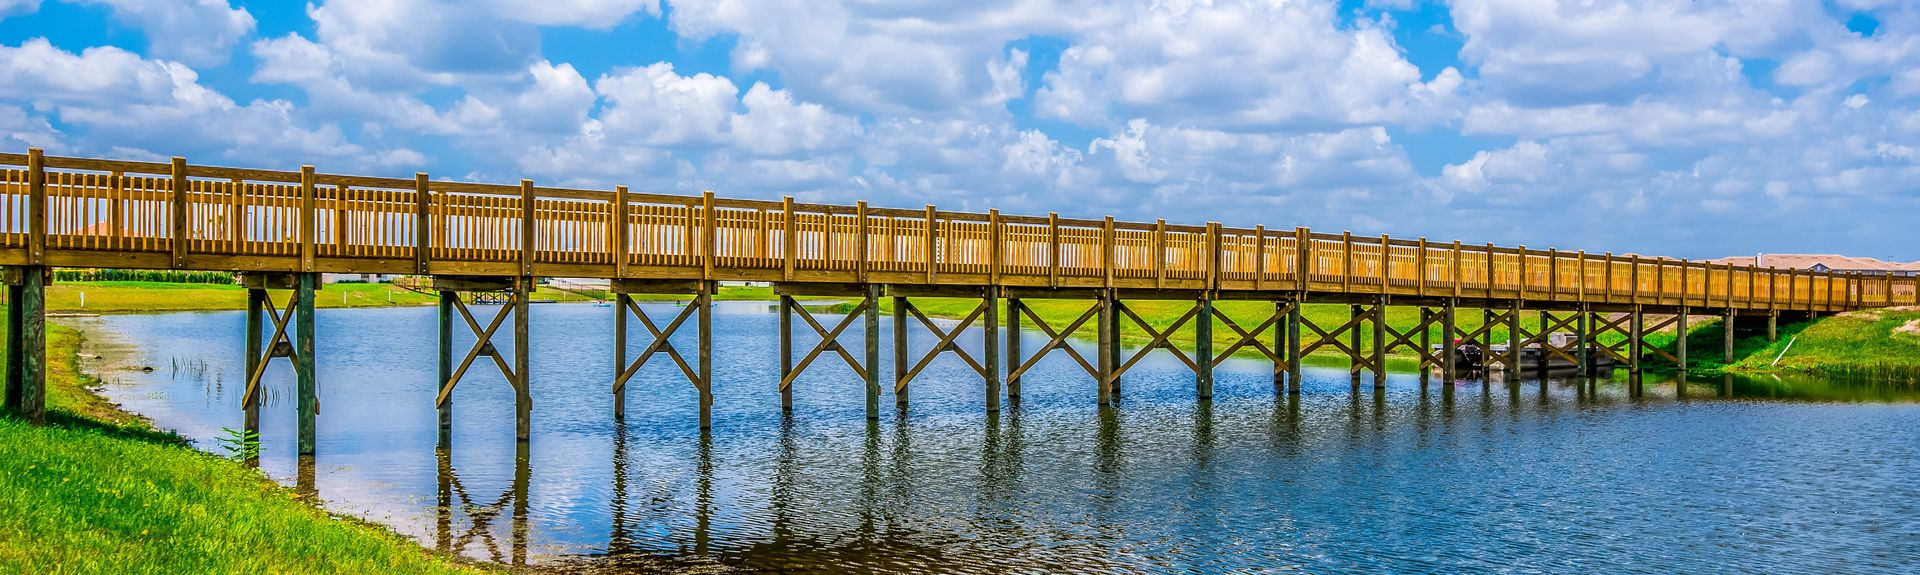 Chatham Park, Kissimmee, Florida, USA